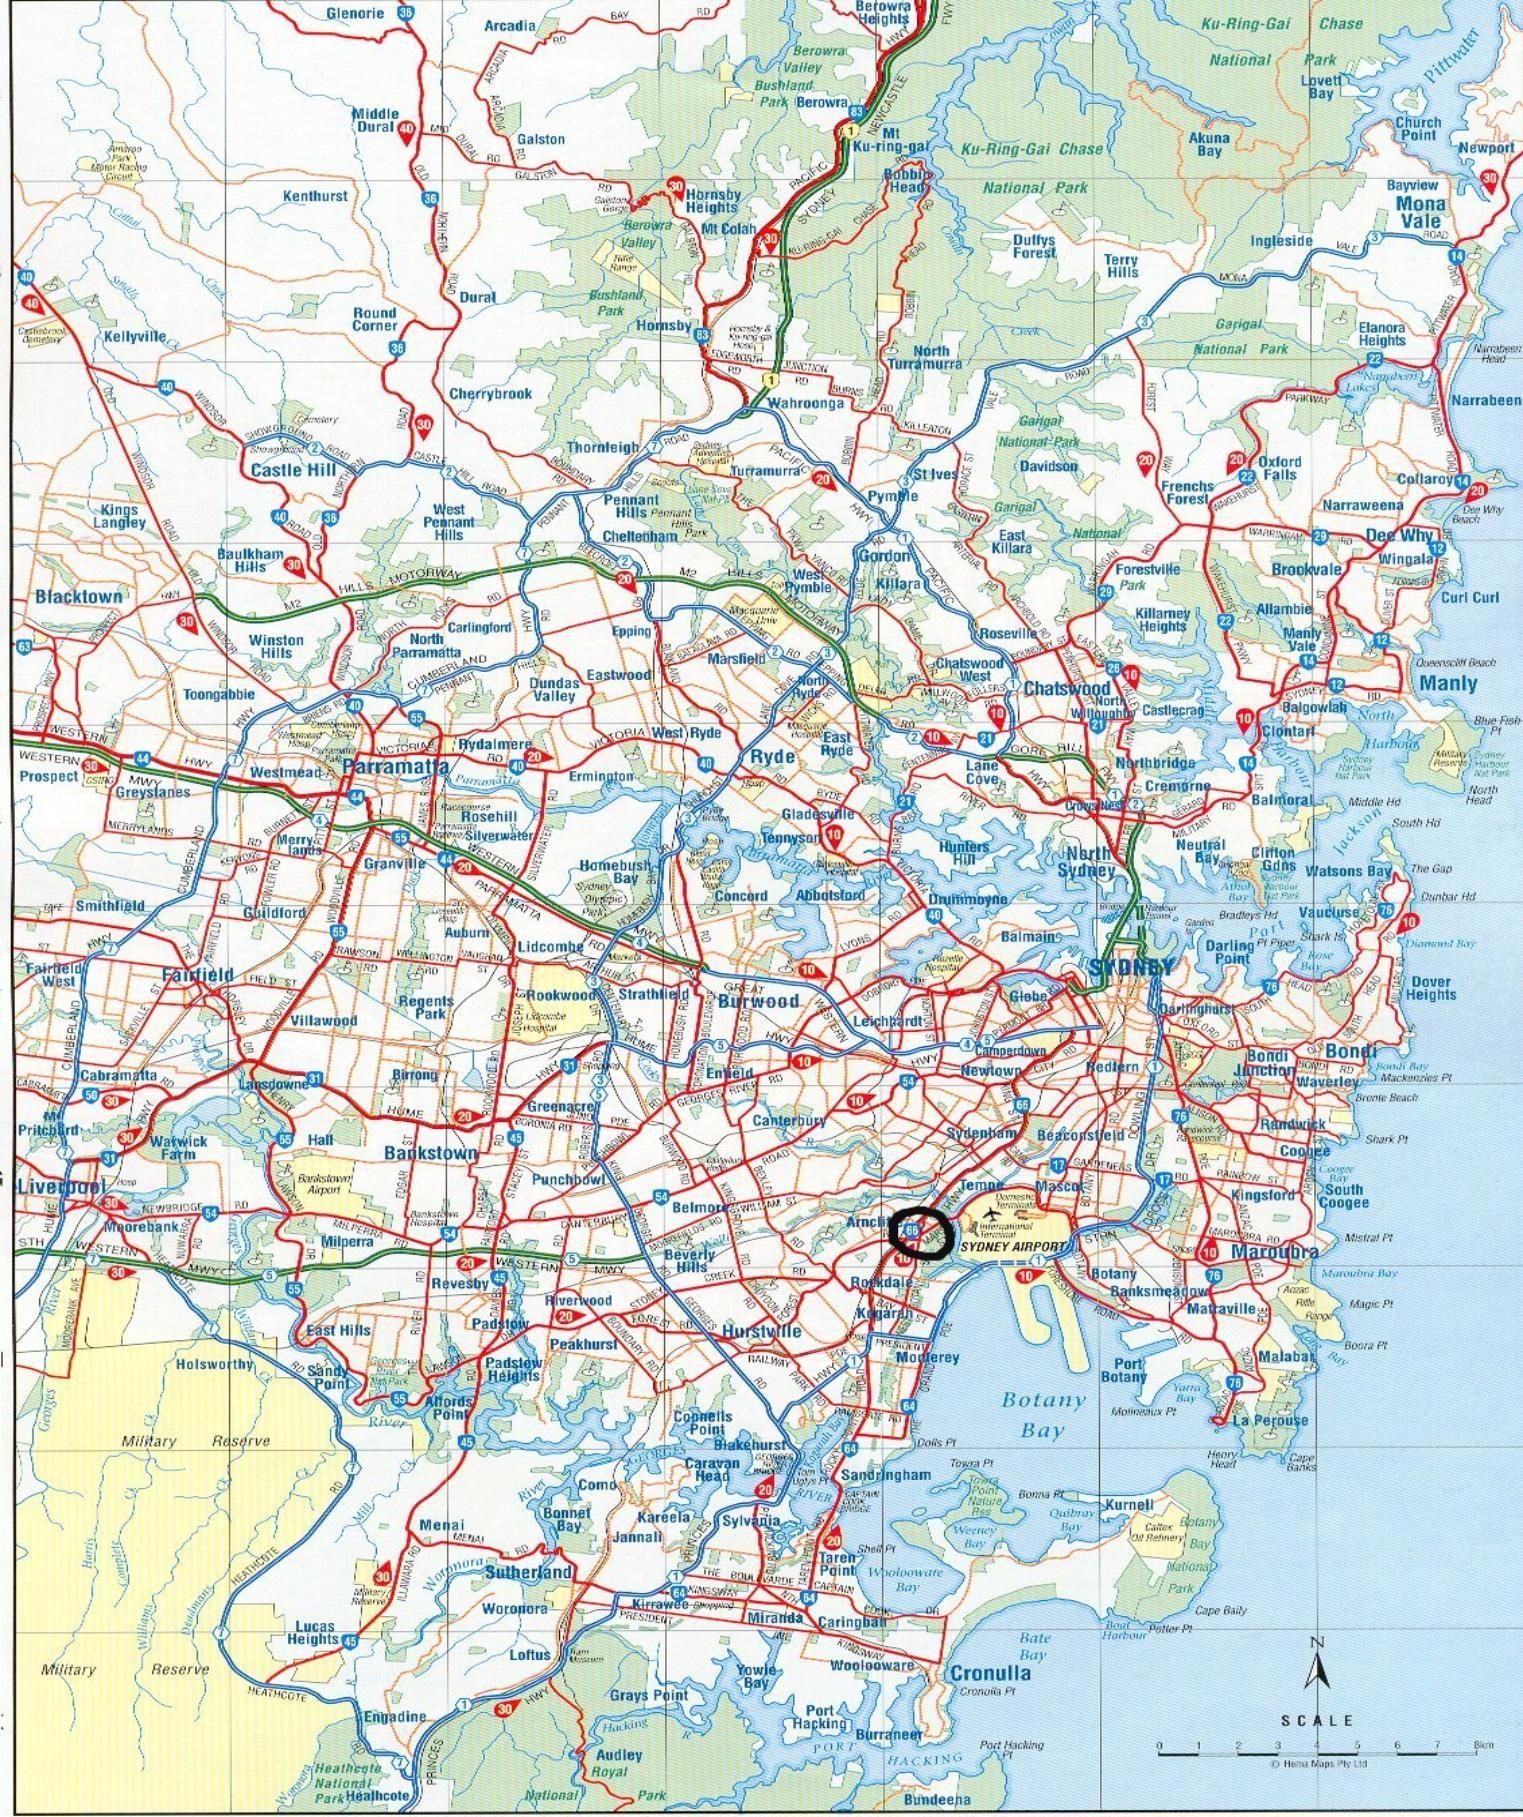 Sydney Road Map Sydney map, Map, Travel maps